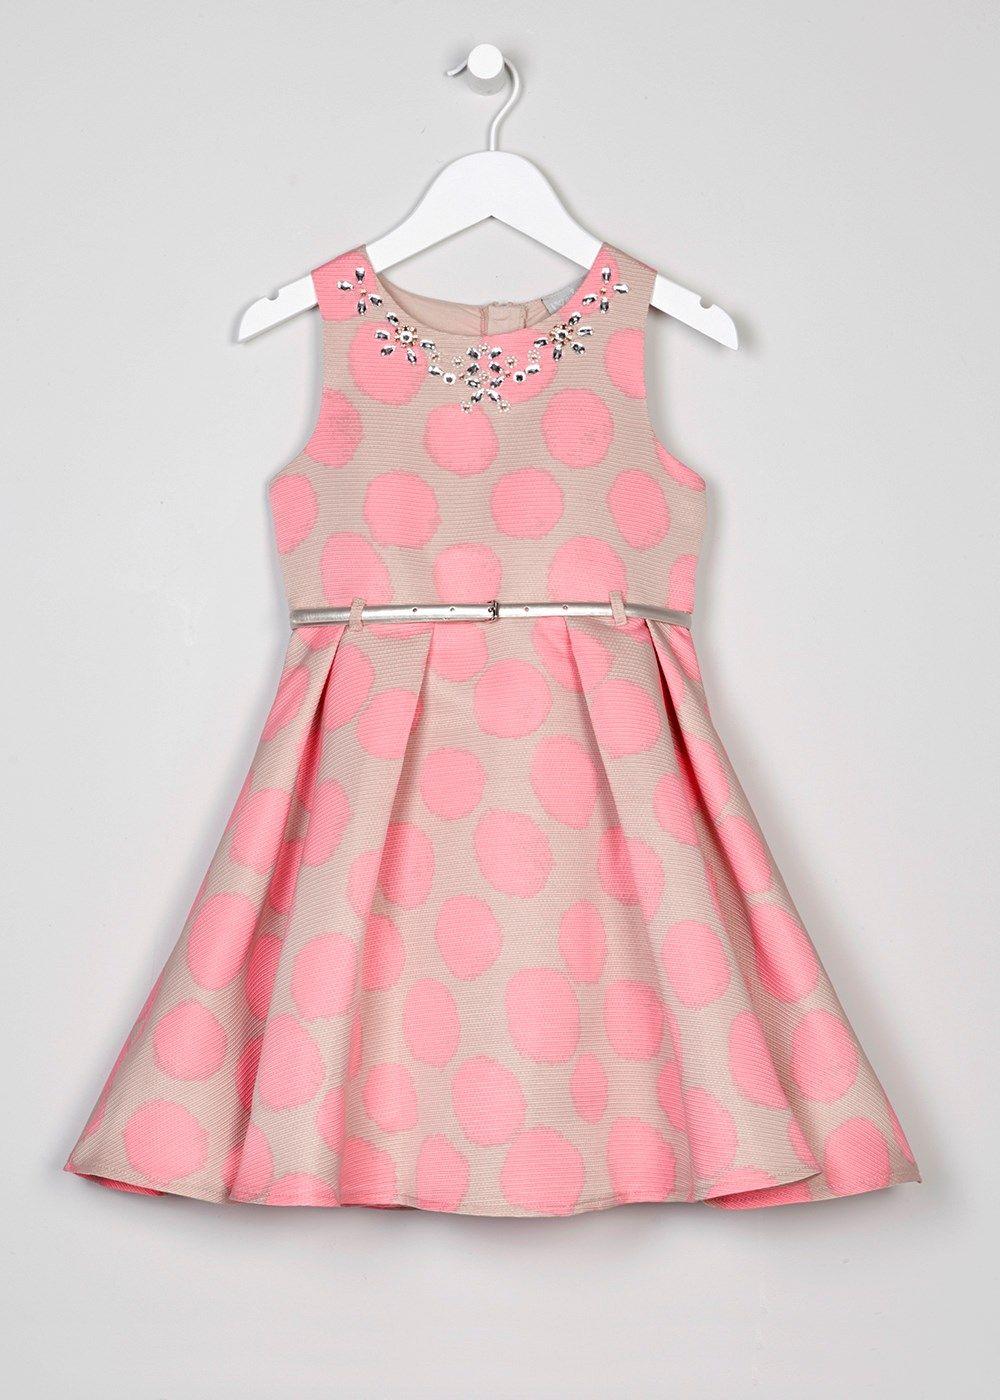 Girls Spot Belted Dress (3-13yrs) | Didi\'s Corner | Pinterest